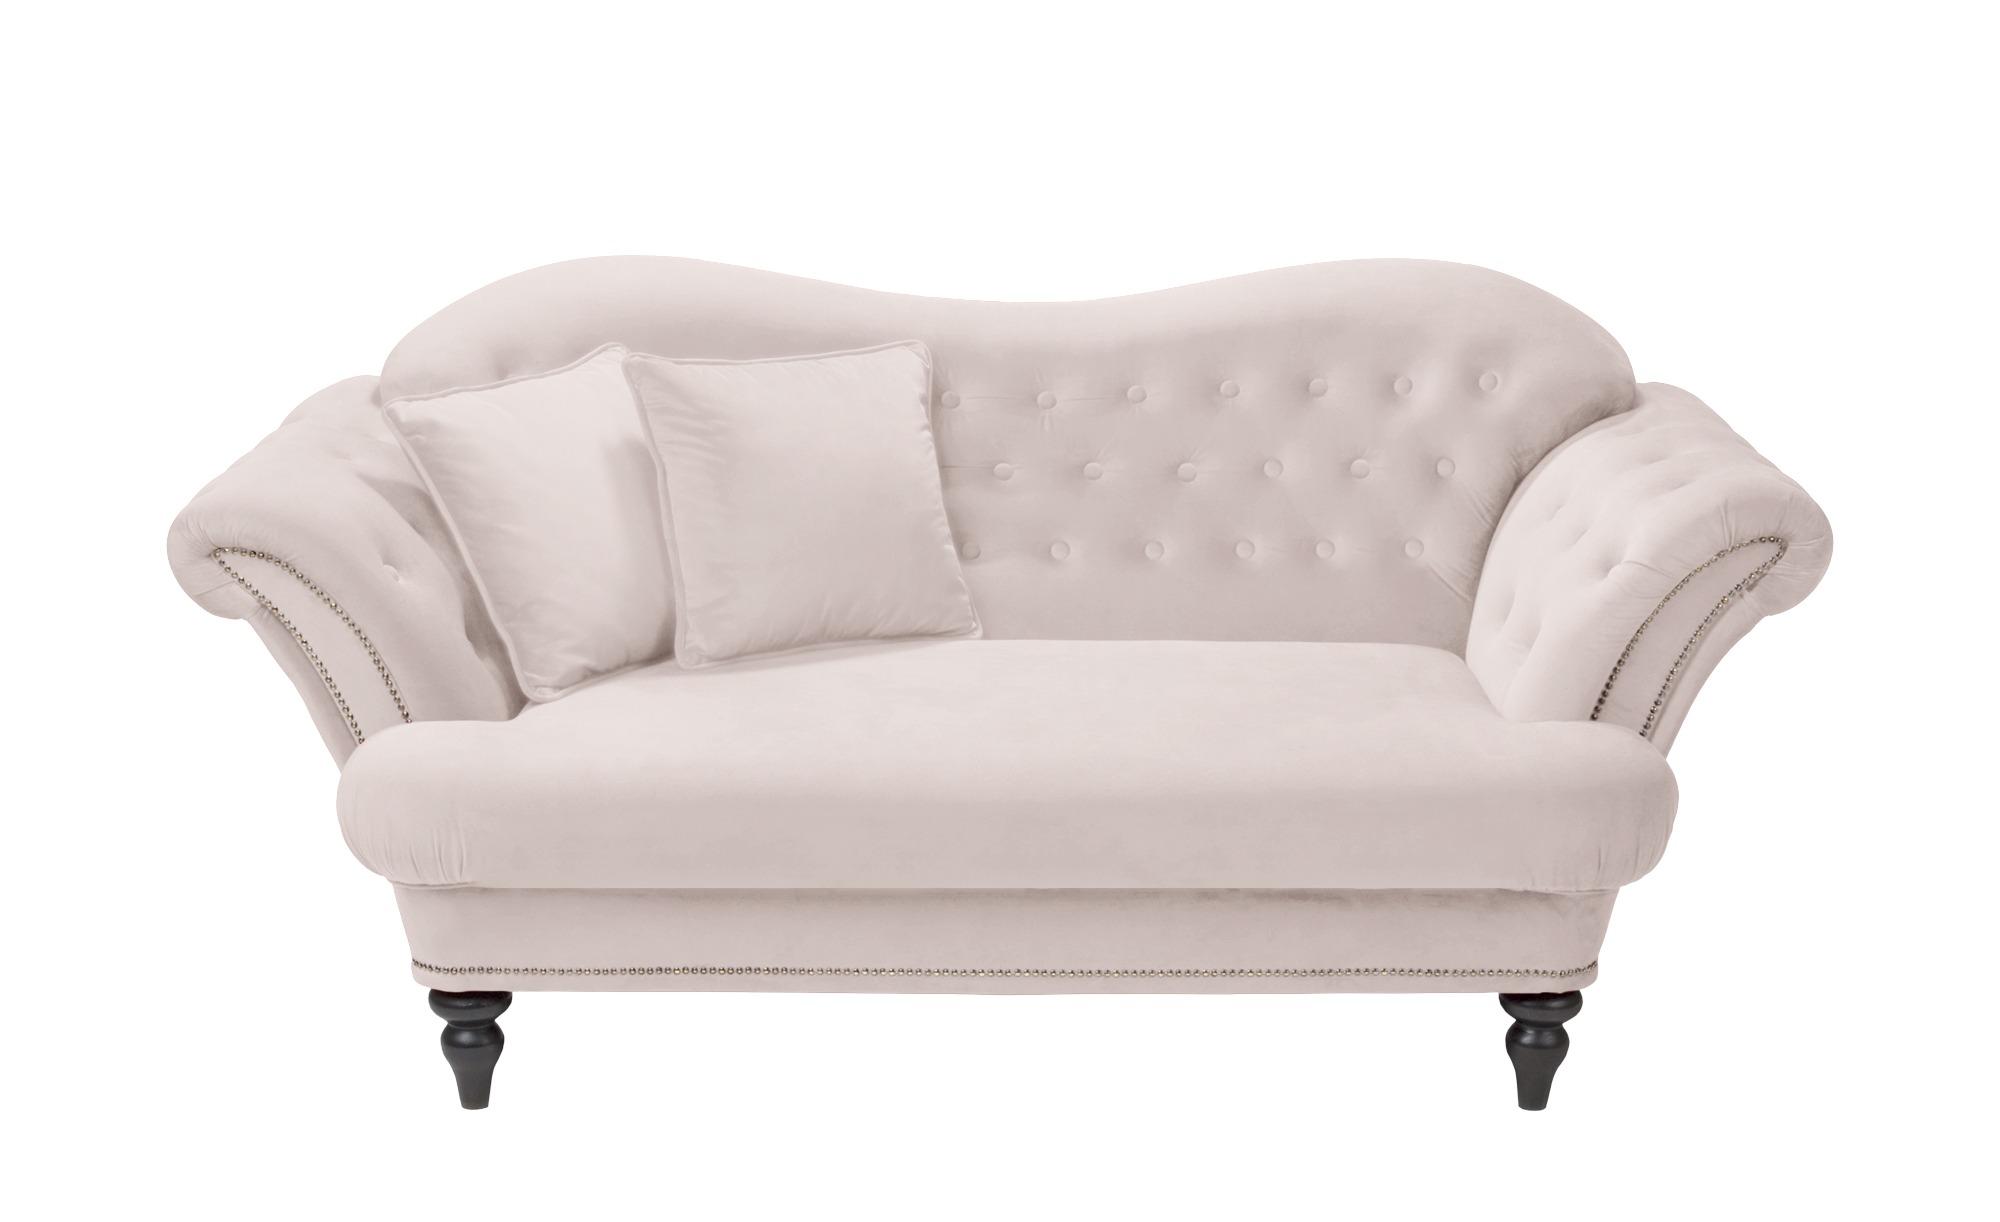 smart Sofa rosa - Mikrofaser Sissi ¦ rosa/pink ¦ Maße (cm): B: 198 H: 93 T: 104 Polstermöbel > Sofas > 2-Sitzer - Höffner